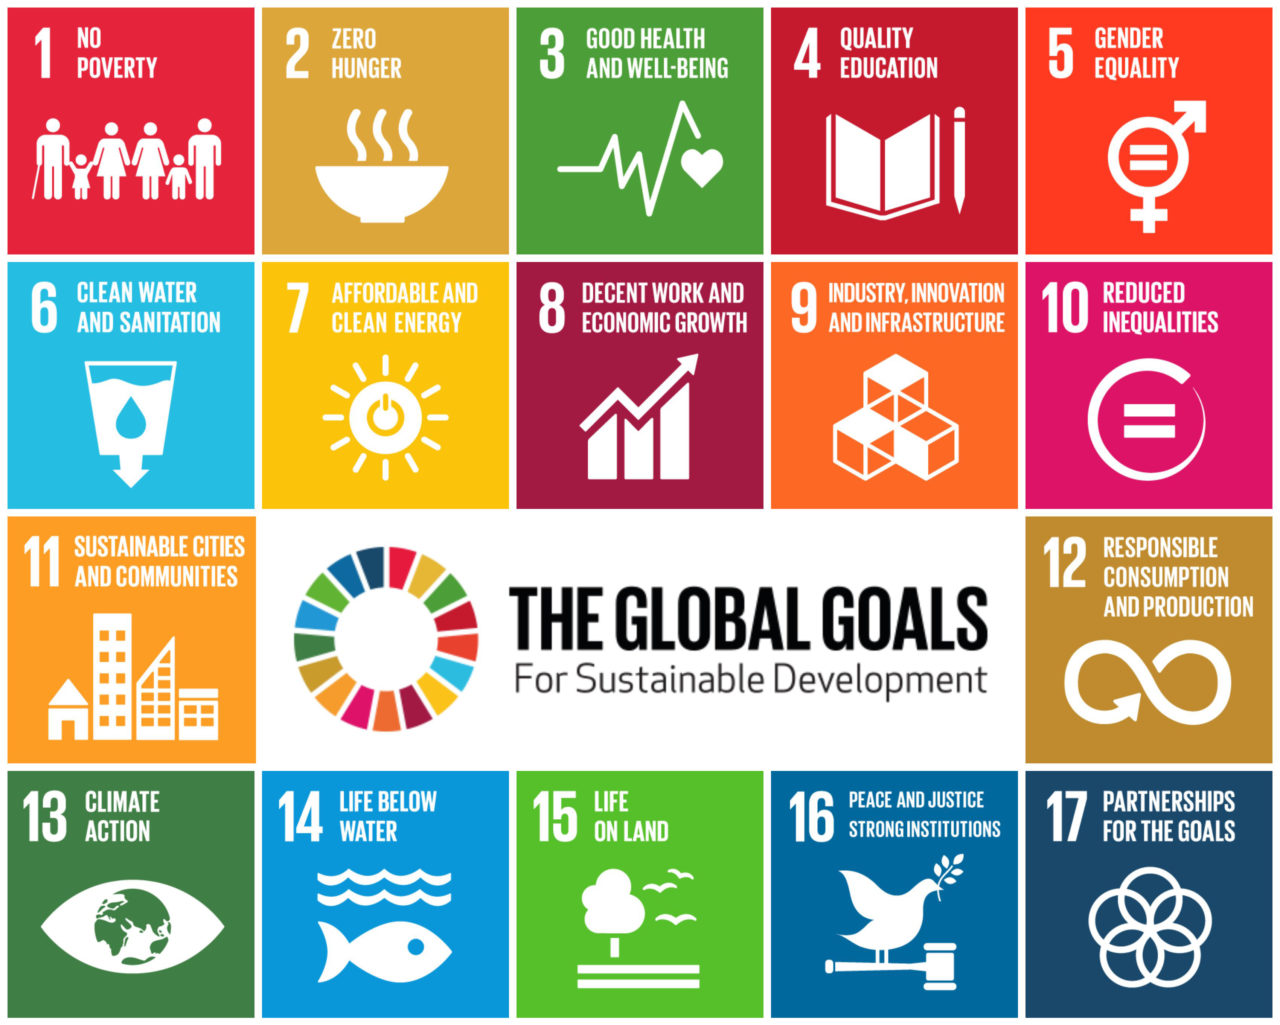 https://anps.gr/wp-content/uploads/2019/09/SDGs-GlobalGoalsForSustainableDevelopment-05-1280x1025.jpg